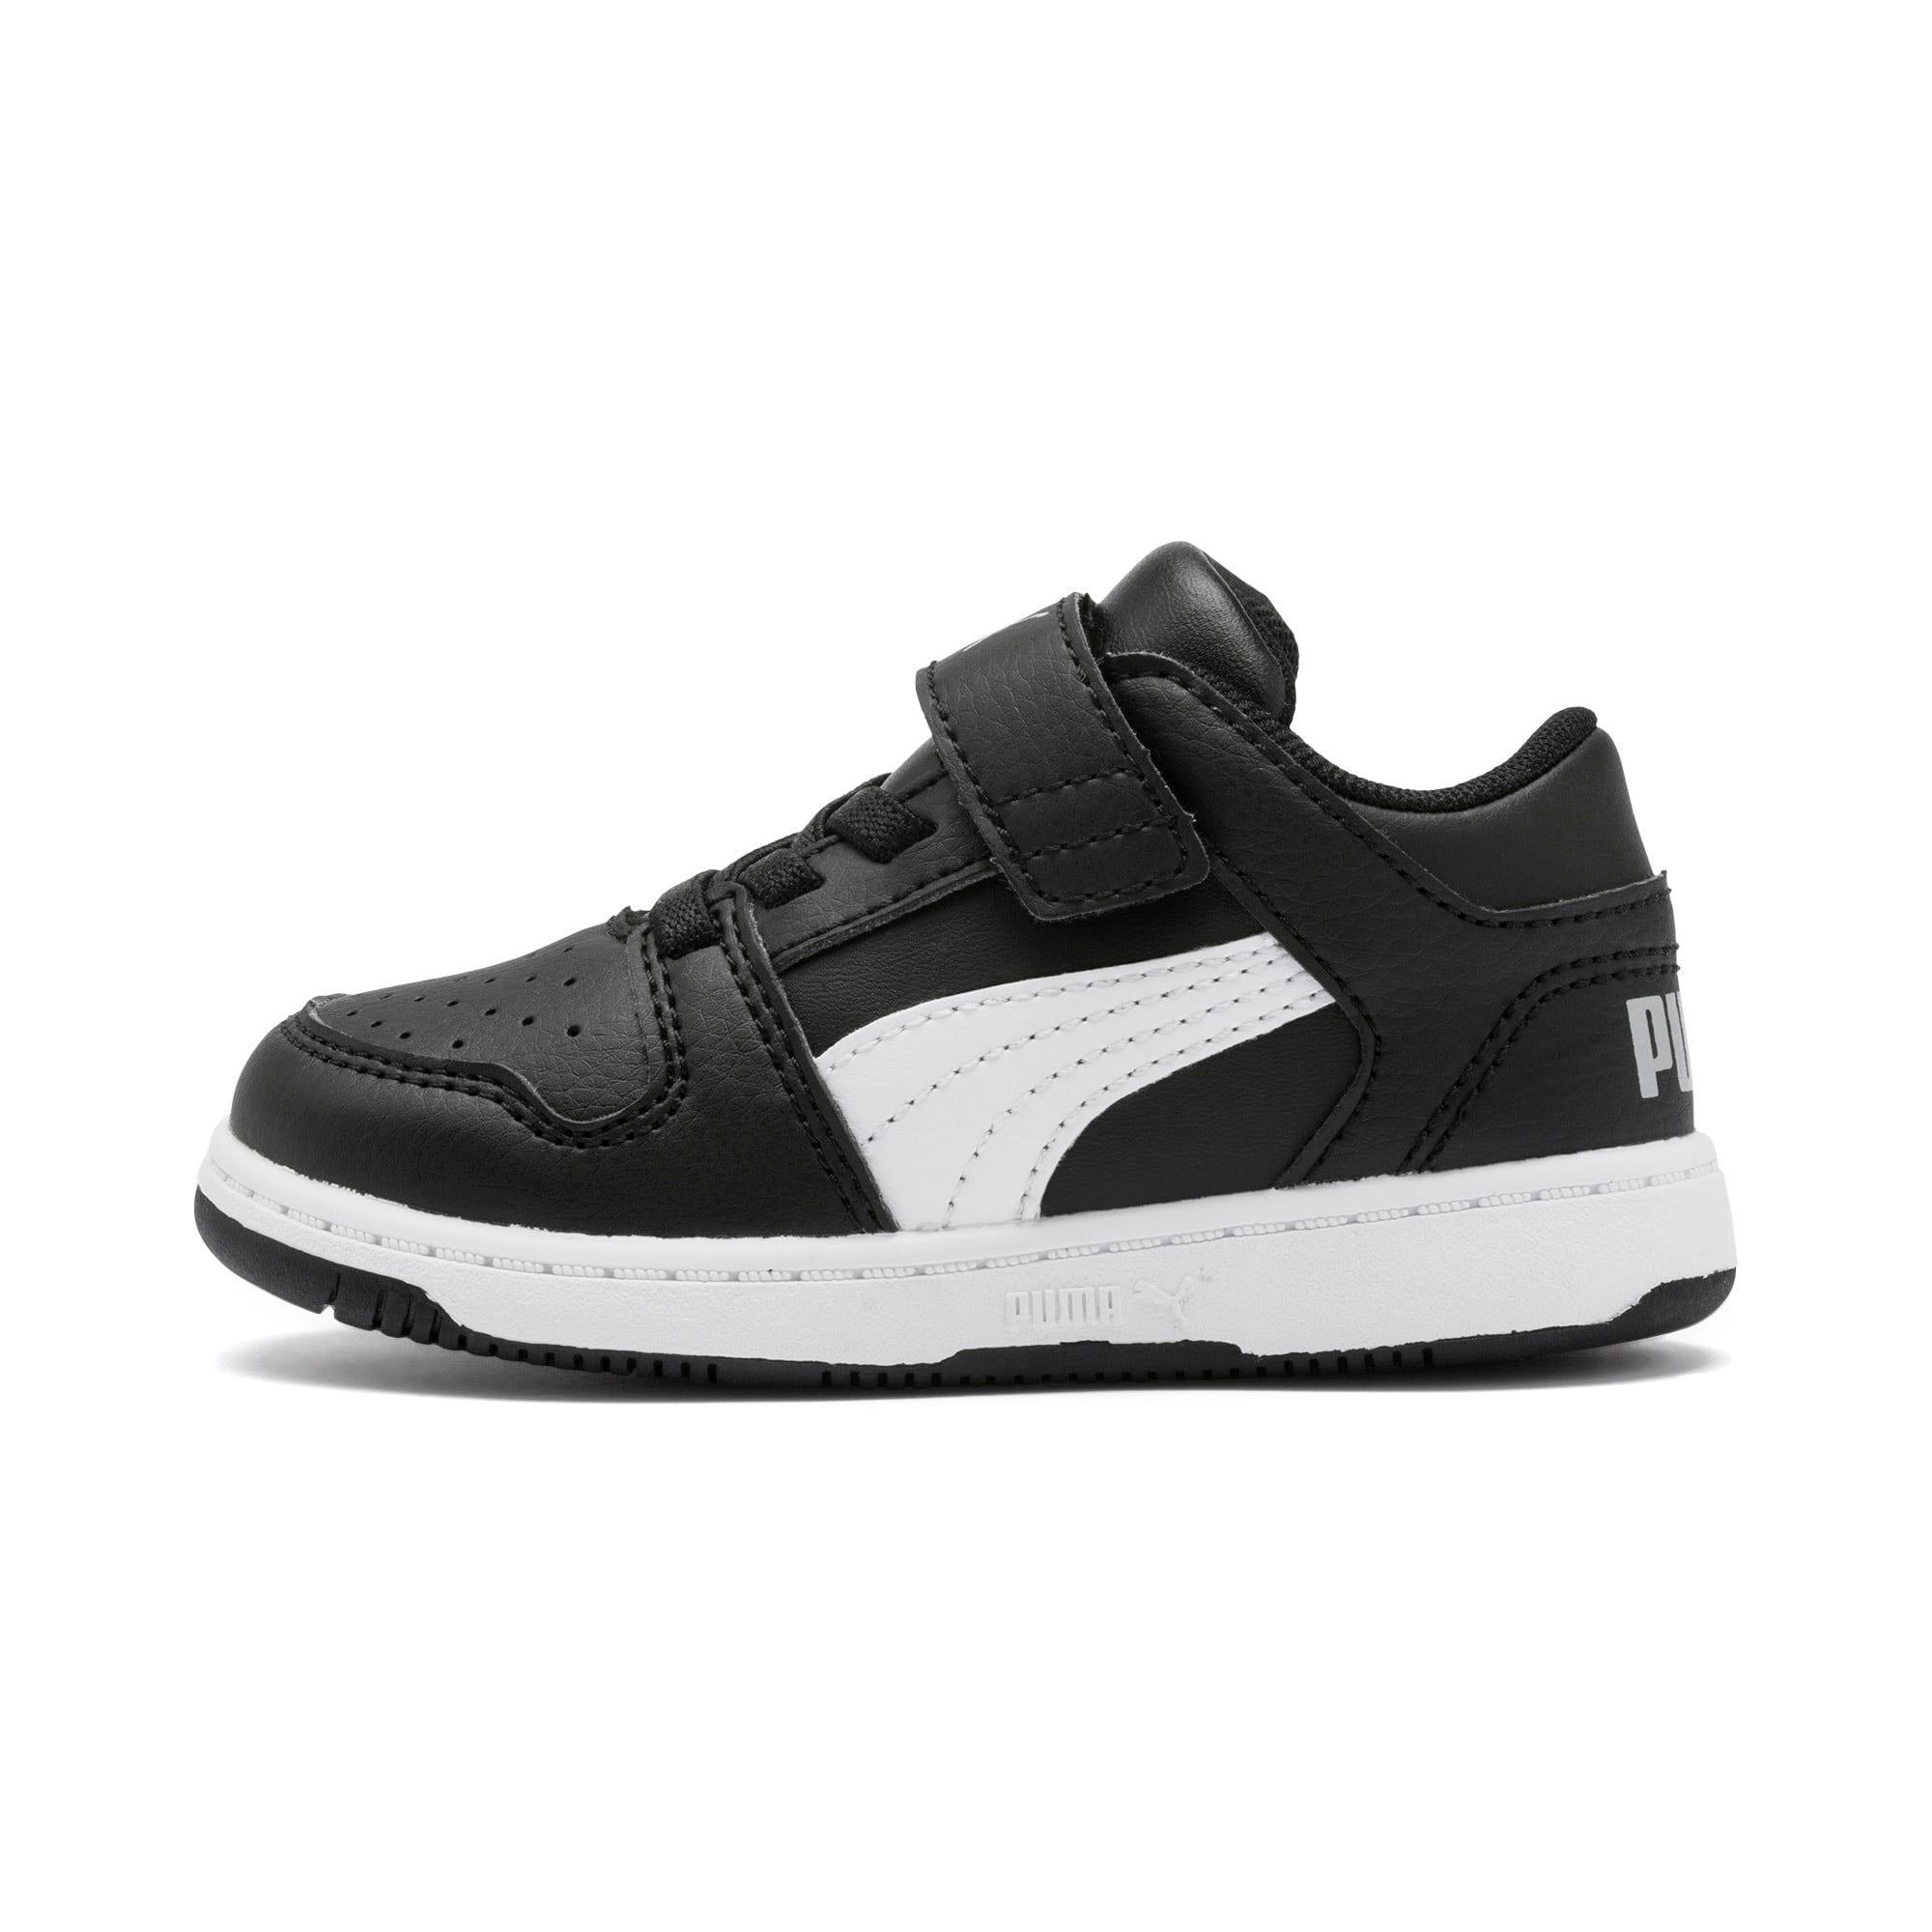 Miniatura 1 de Zapatos deportivos PUMA Rebound LayUp Lo para INF, Puma Black-Blanco-High Rise, mediano